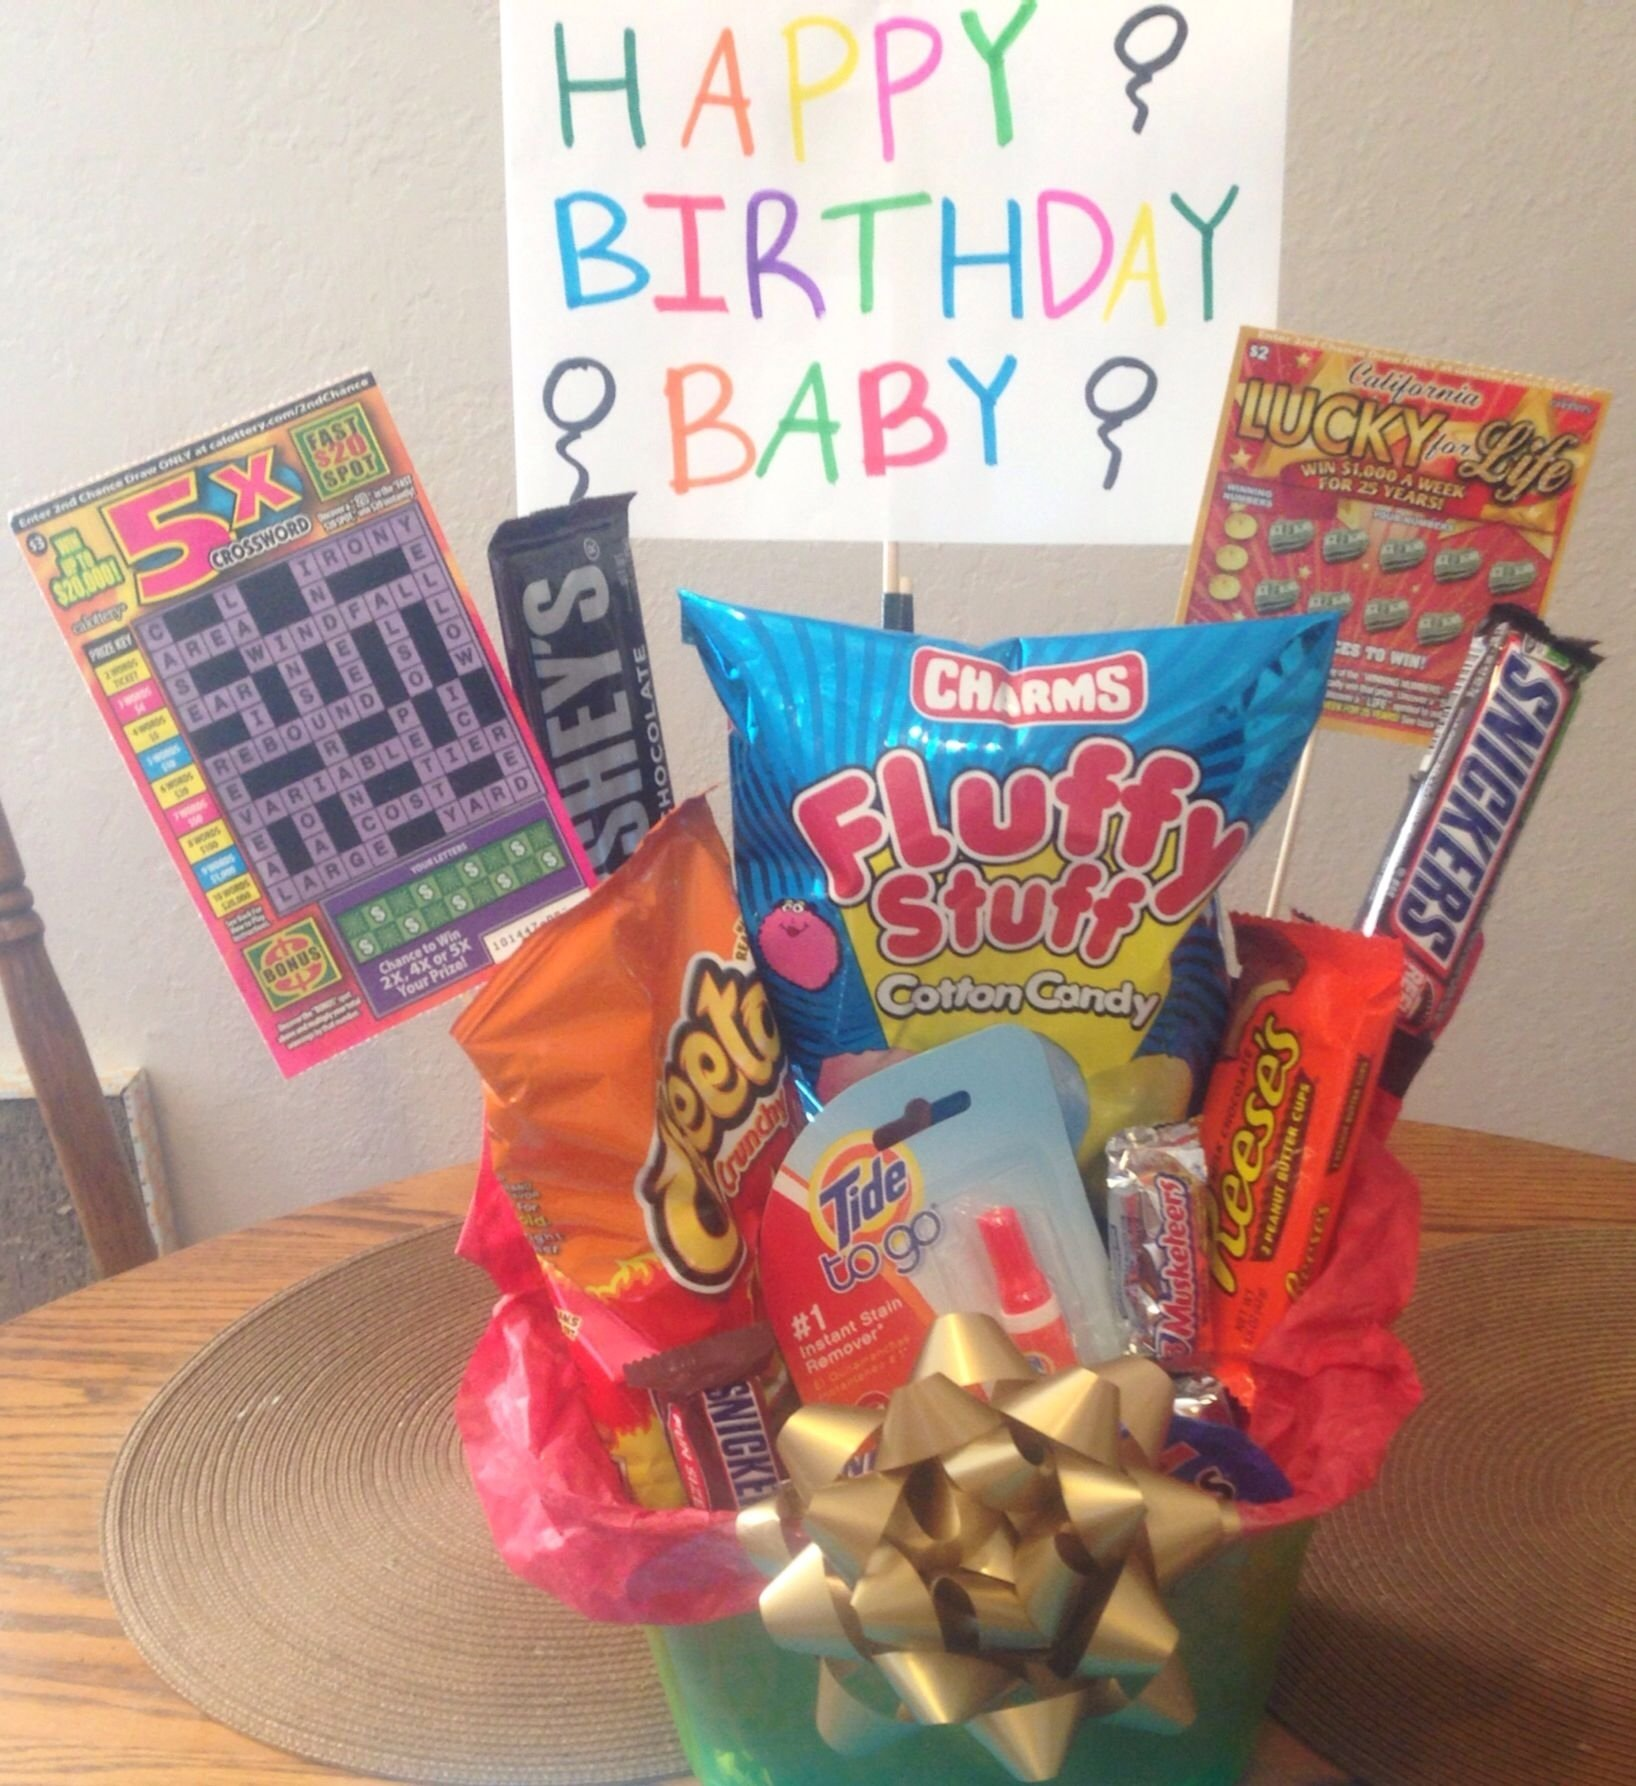 10 Most Popular Gift Ideas For My Boyfriend for my boyfriends 22nd birthday my projects pinterest 22 birthday 1 2020